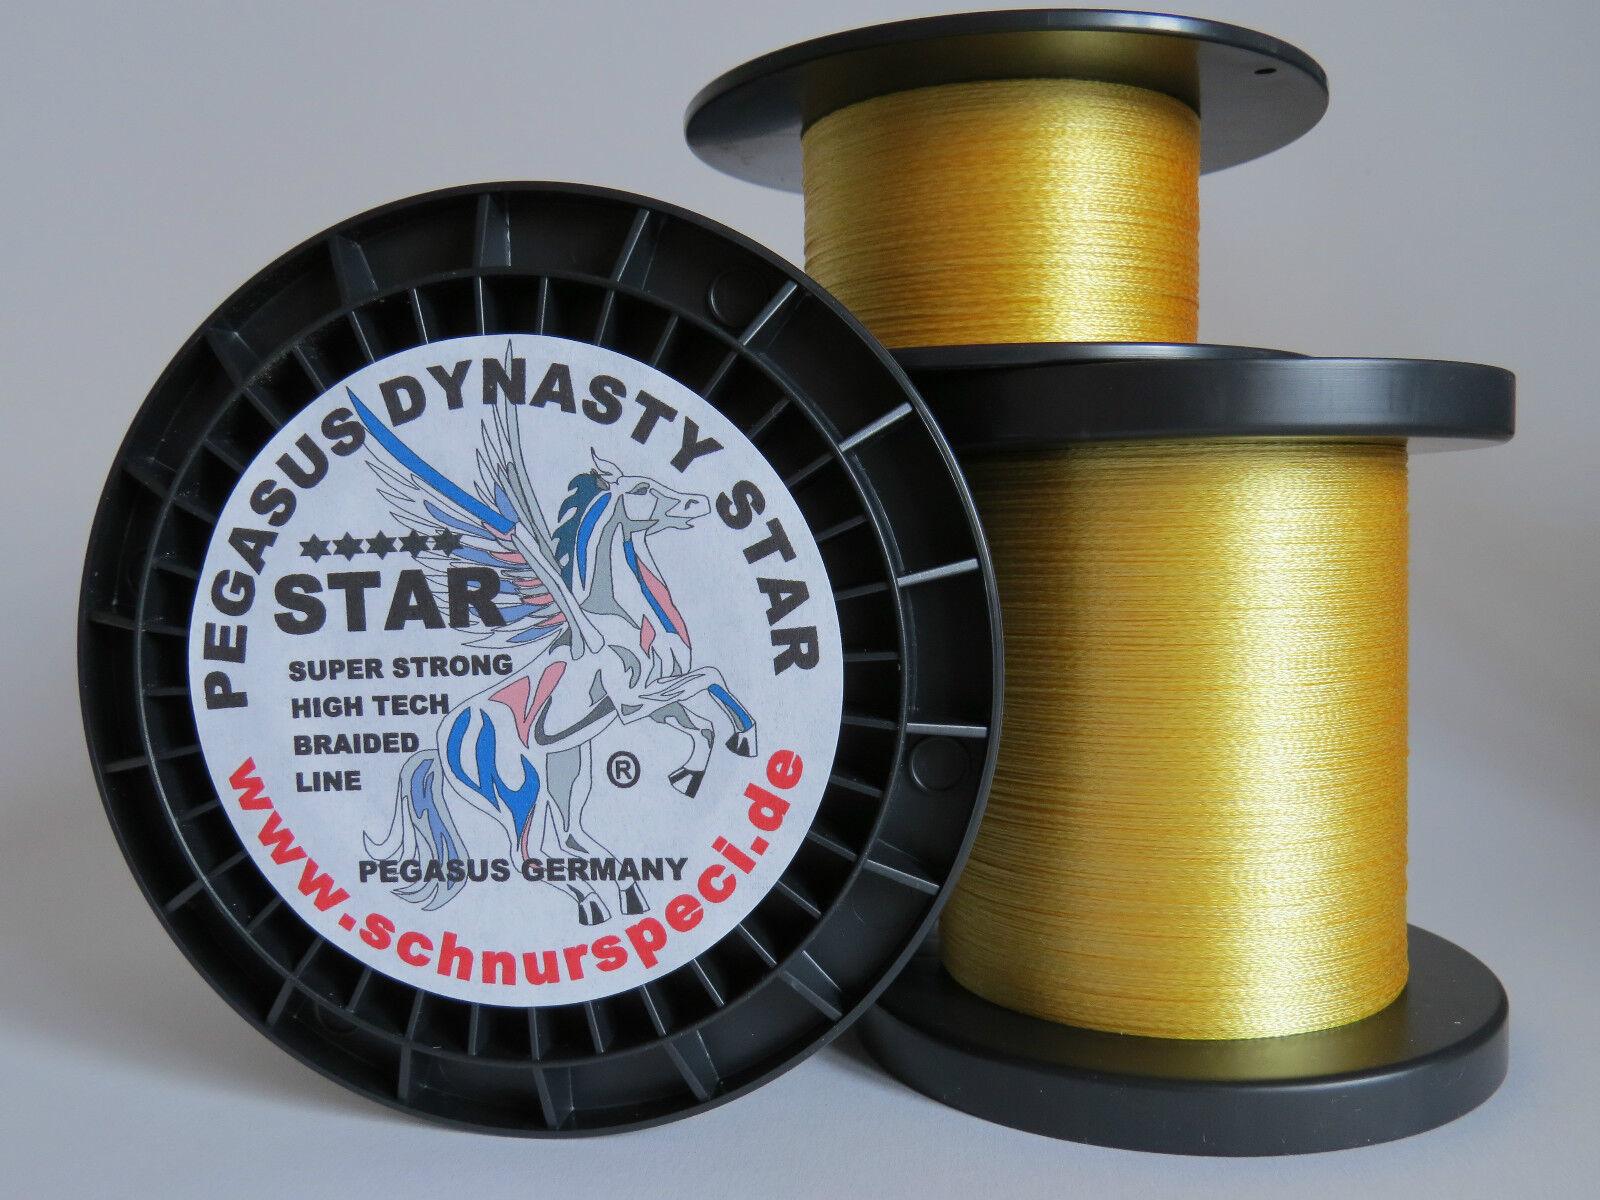 Dynasty Dynasty Dynasty Star geflochtene Angelschnur 3000m gelb 6 Typen zur Auswahl ab 1m  946d7a